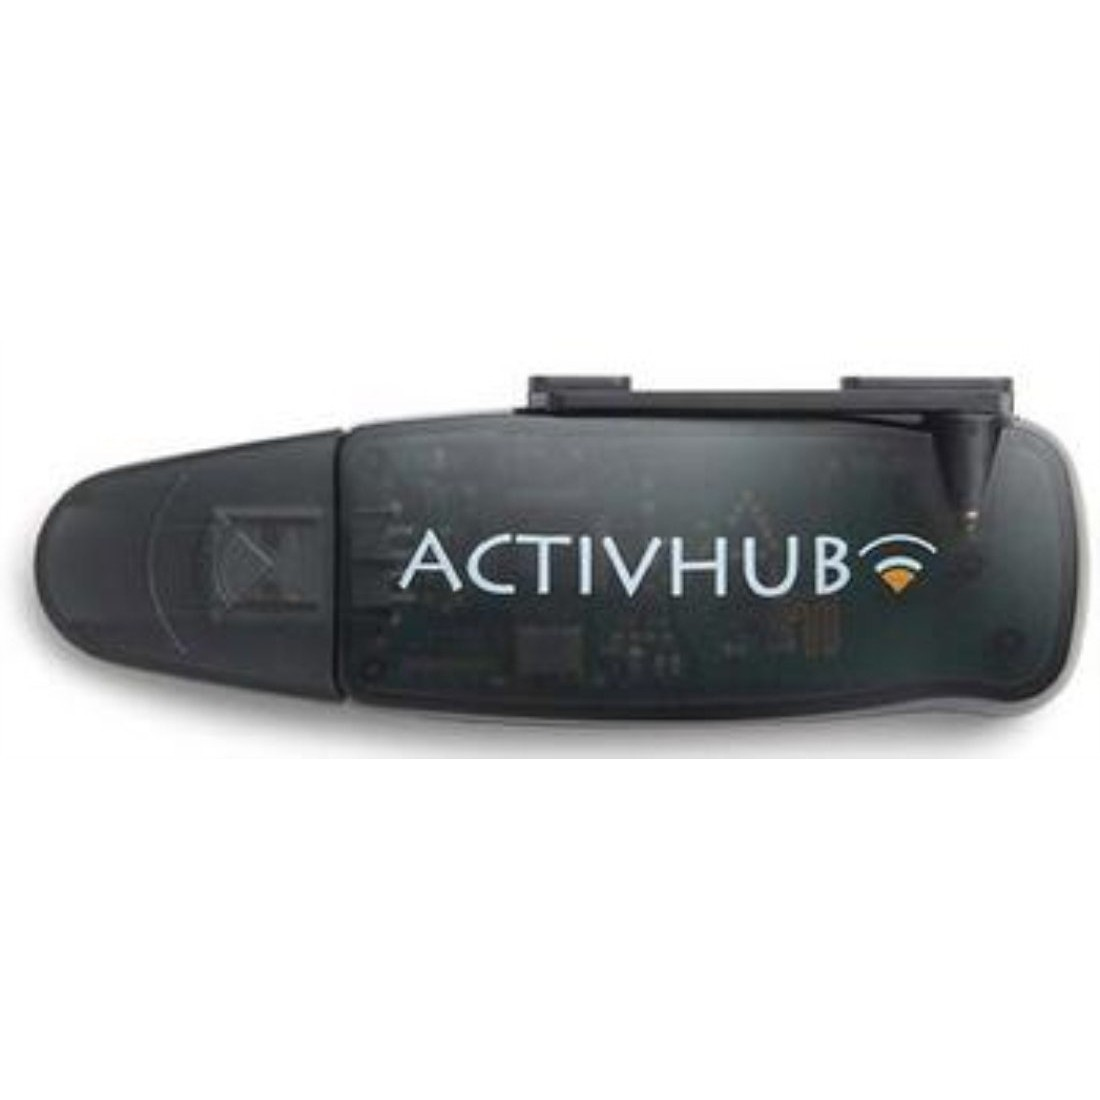 ActivHub Dongle USB radiofréquence